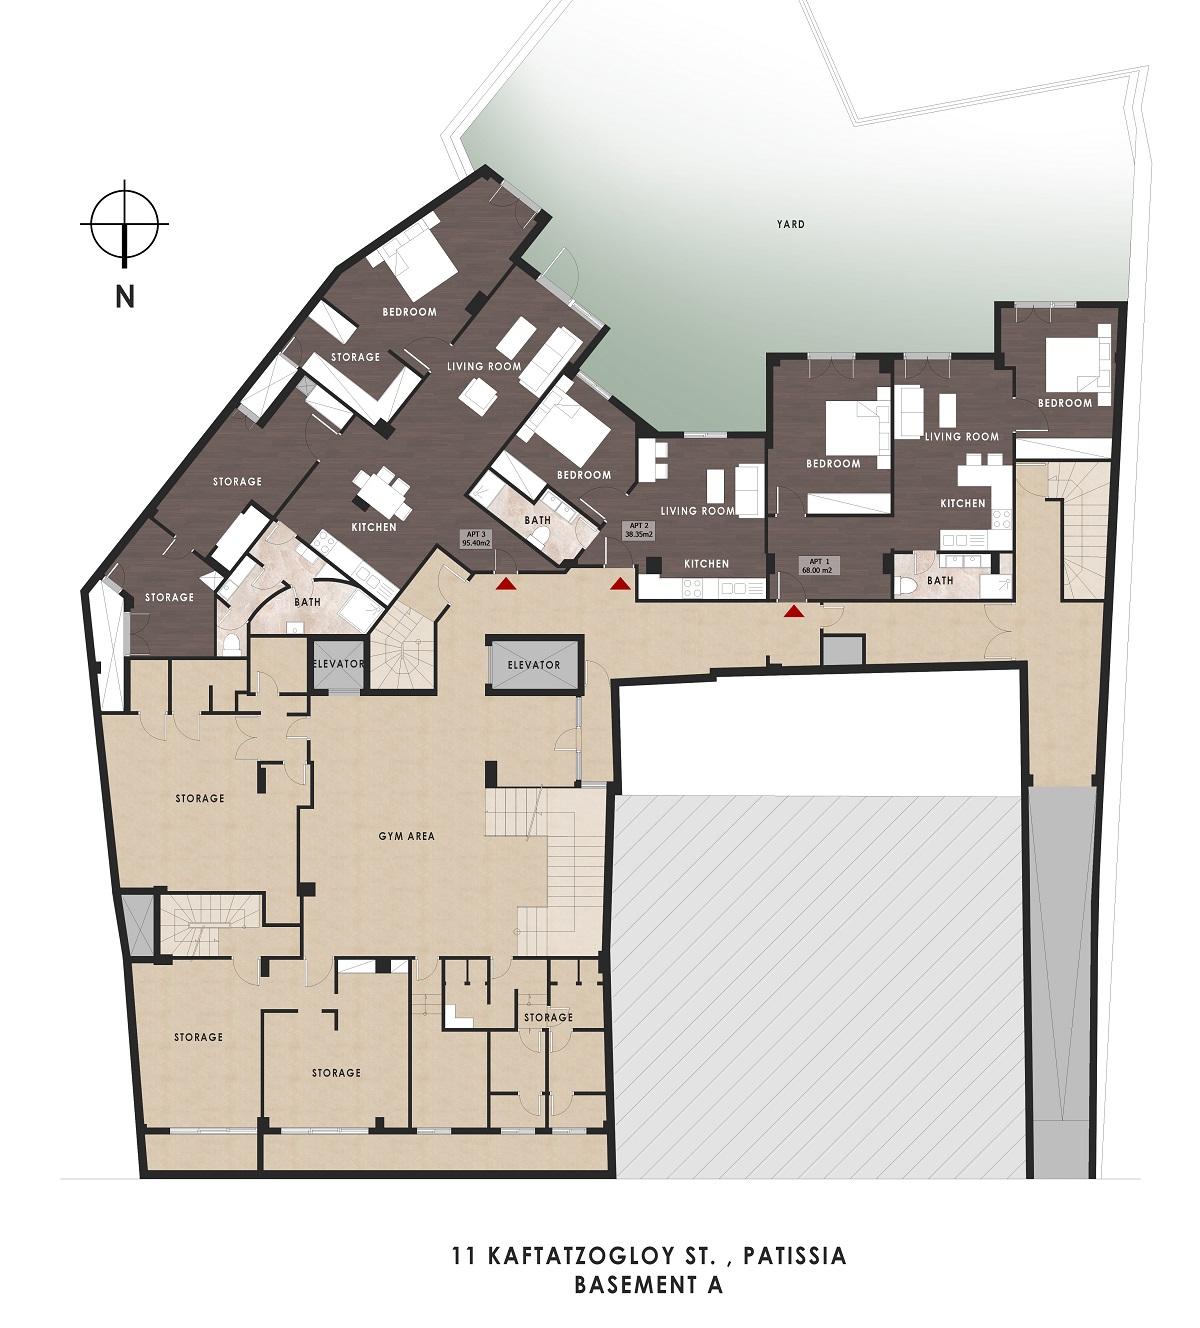 Kaftantzoglou 11 1st basement plan